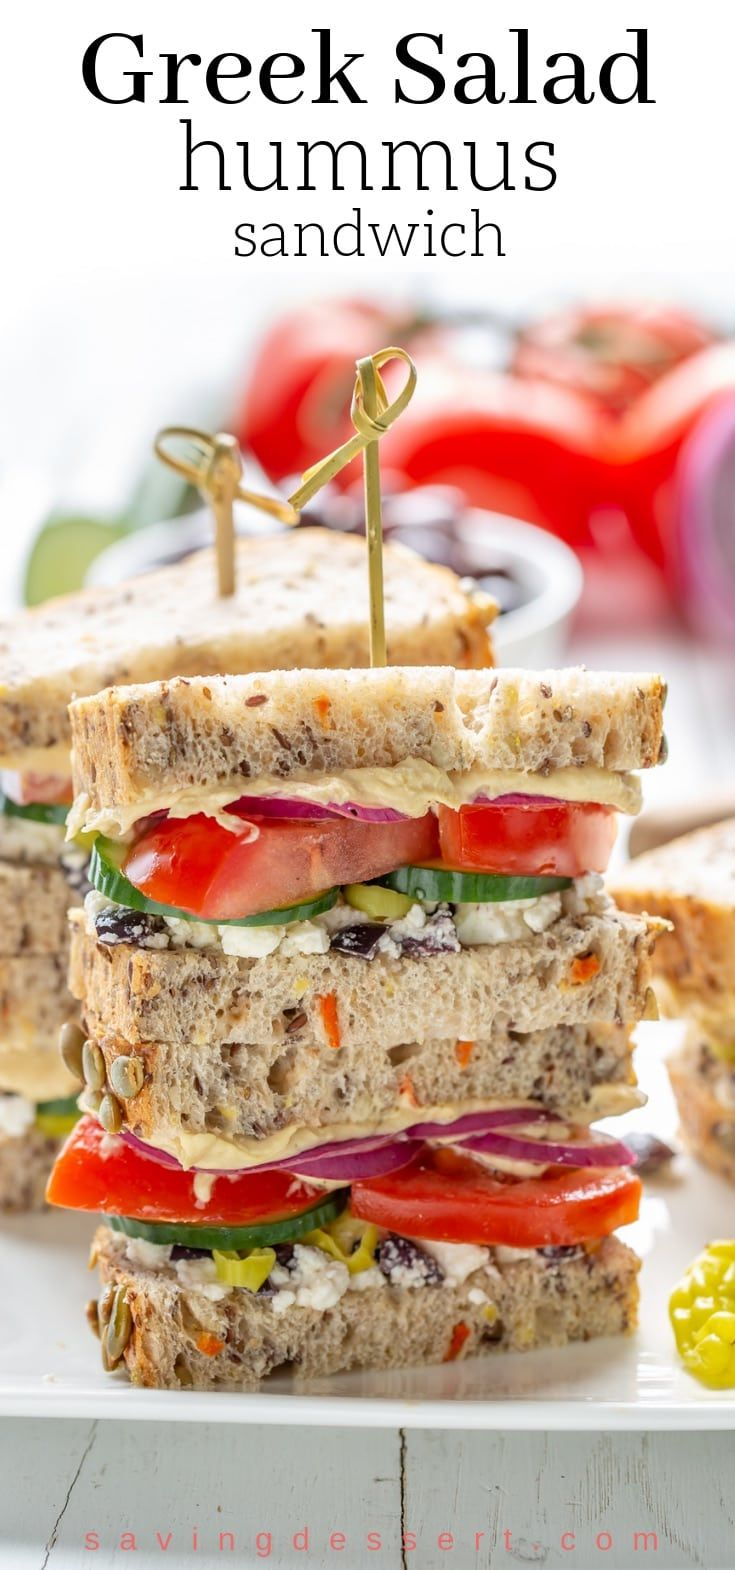 Greek Salad Hummus Sandwich